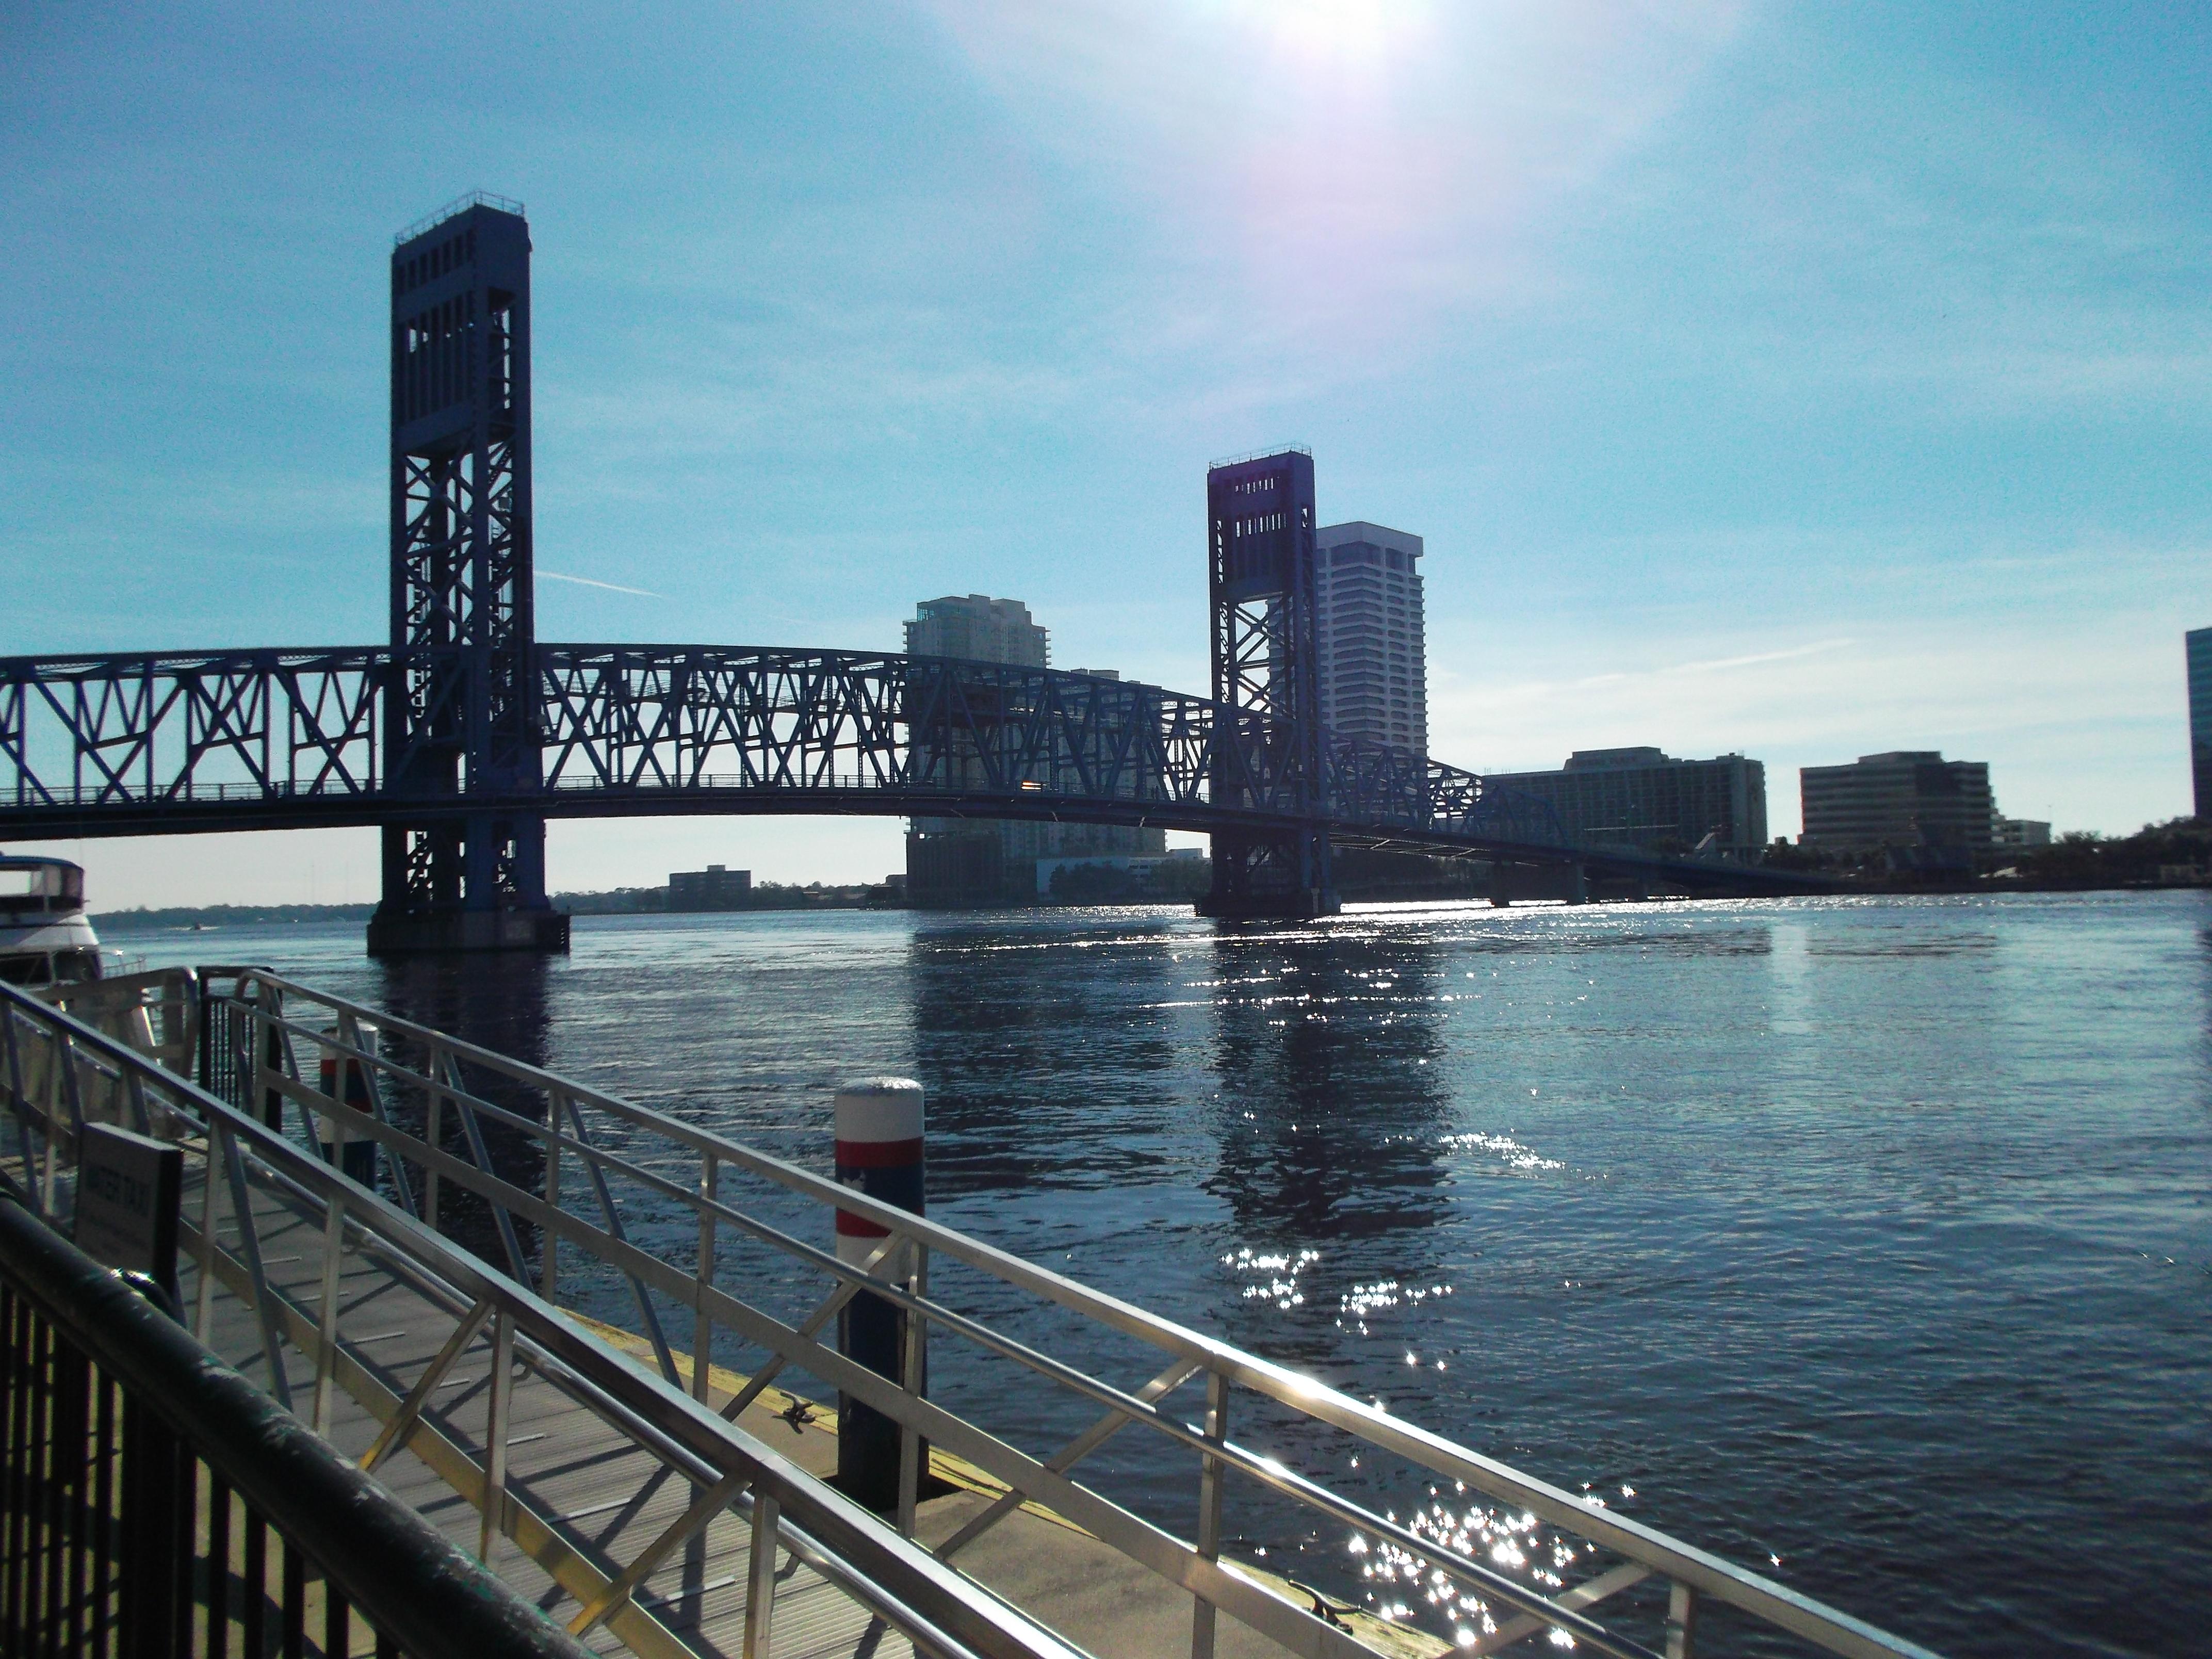 Gator Bowl Northwestern Mississippi State Jacksonville Bridge